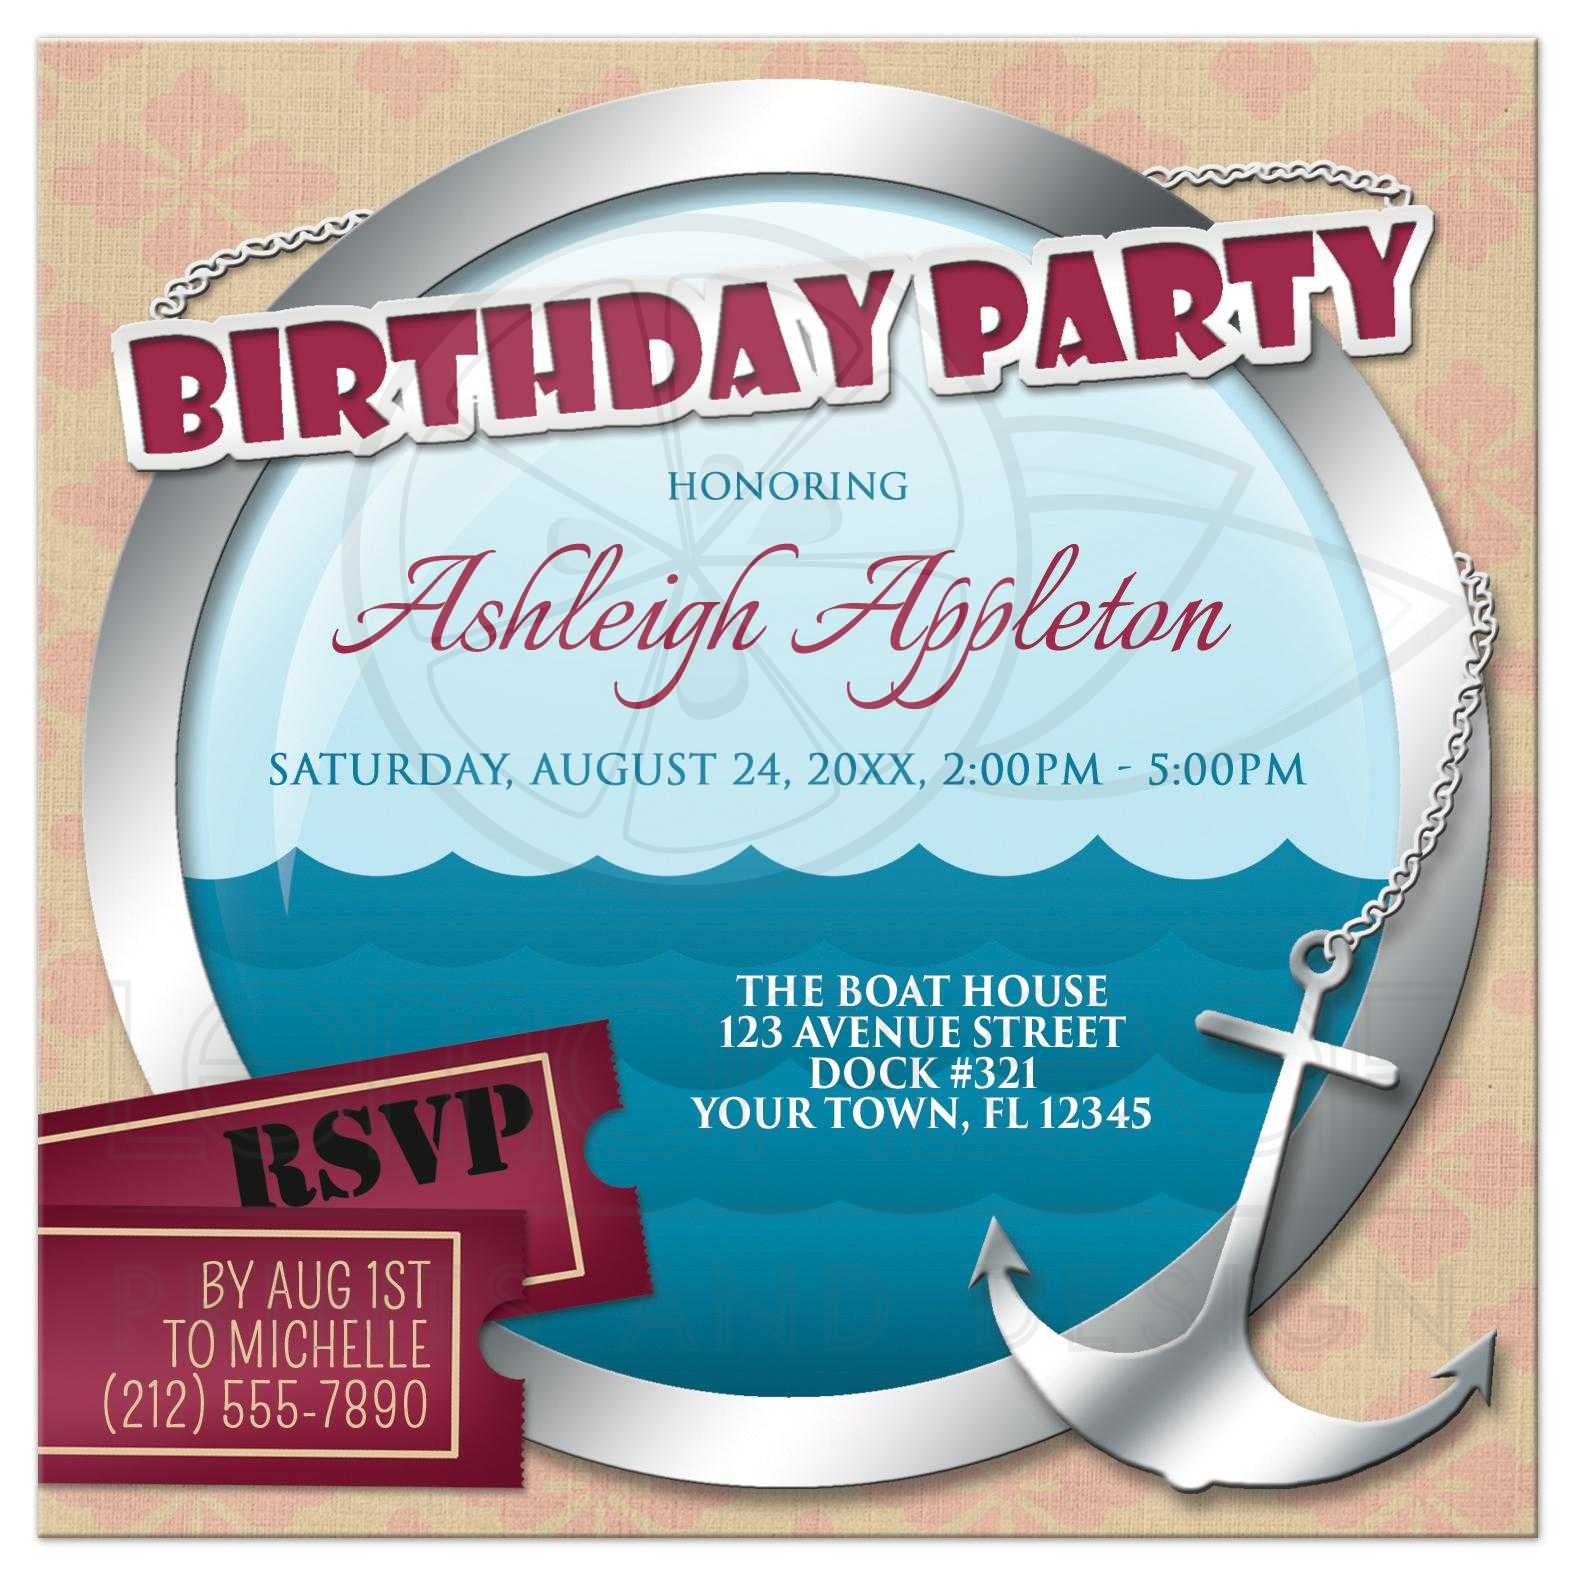 Birthday Party Invitations - Nautical Anchor & Porthole At Sea